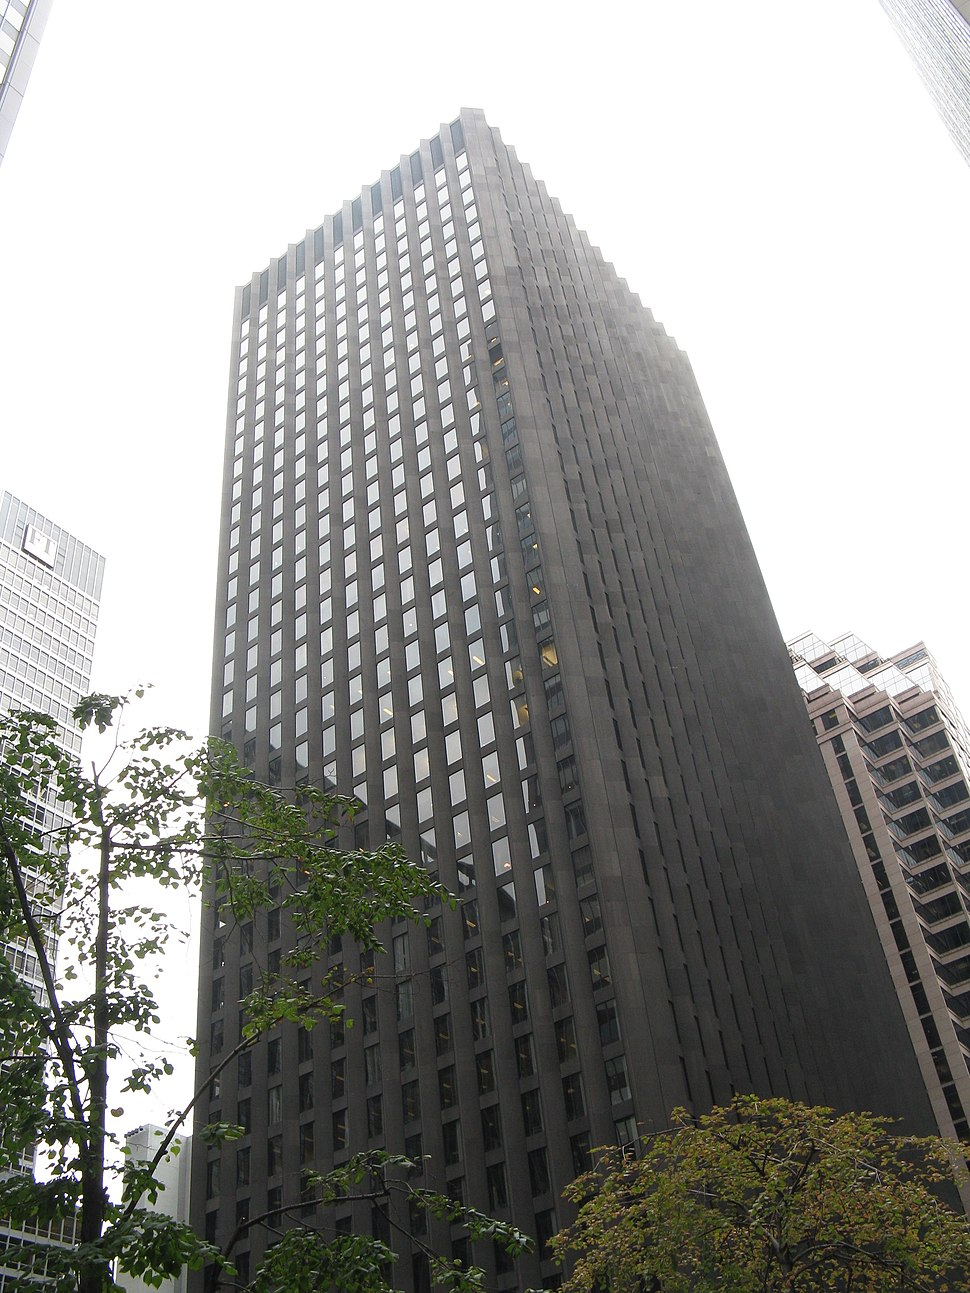 Cbs-building